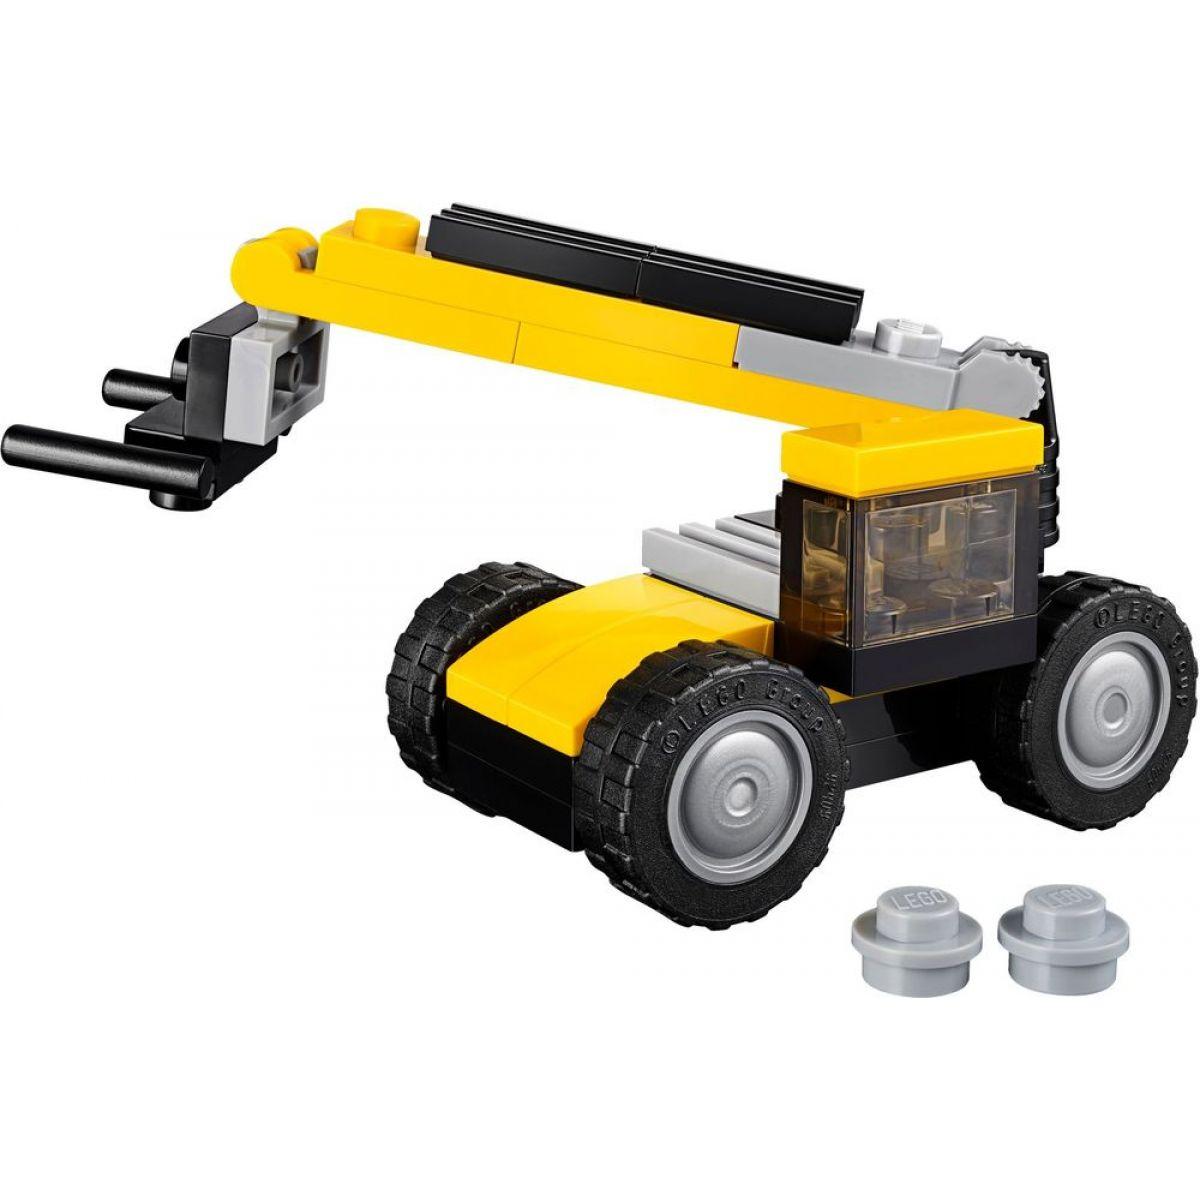 LEGO Creator 31041 Vozidla na stavbě #4